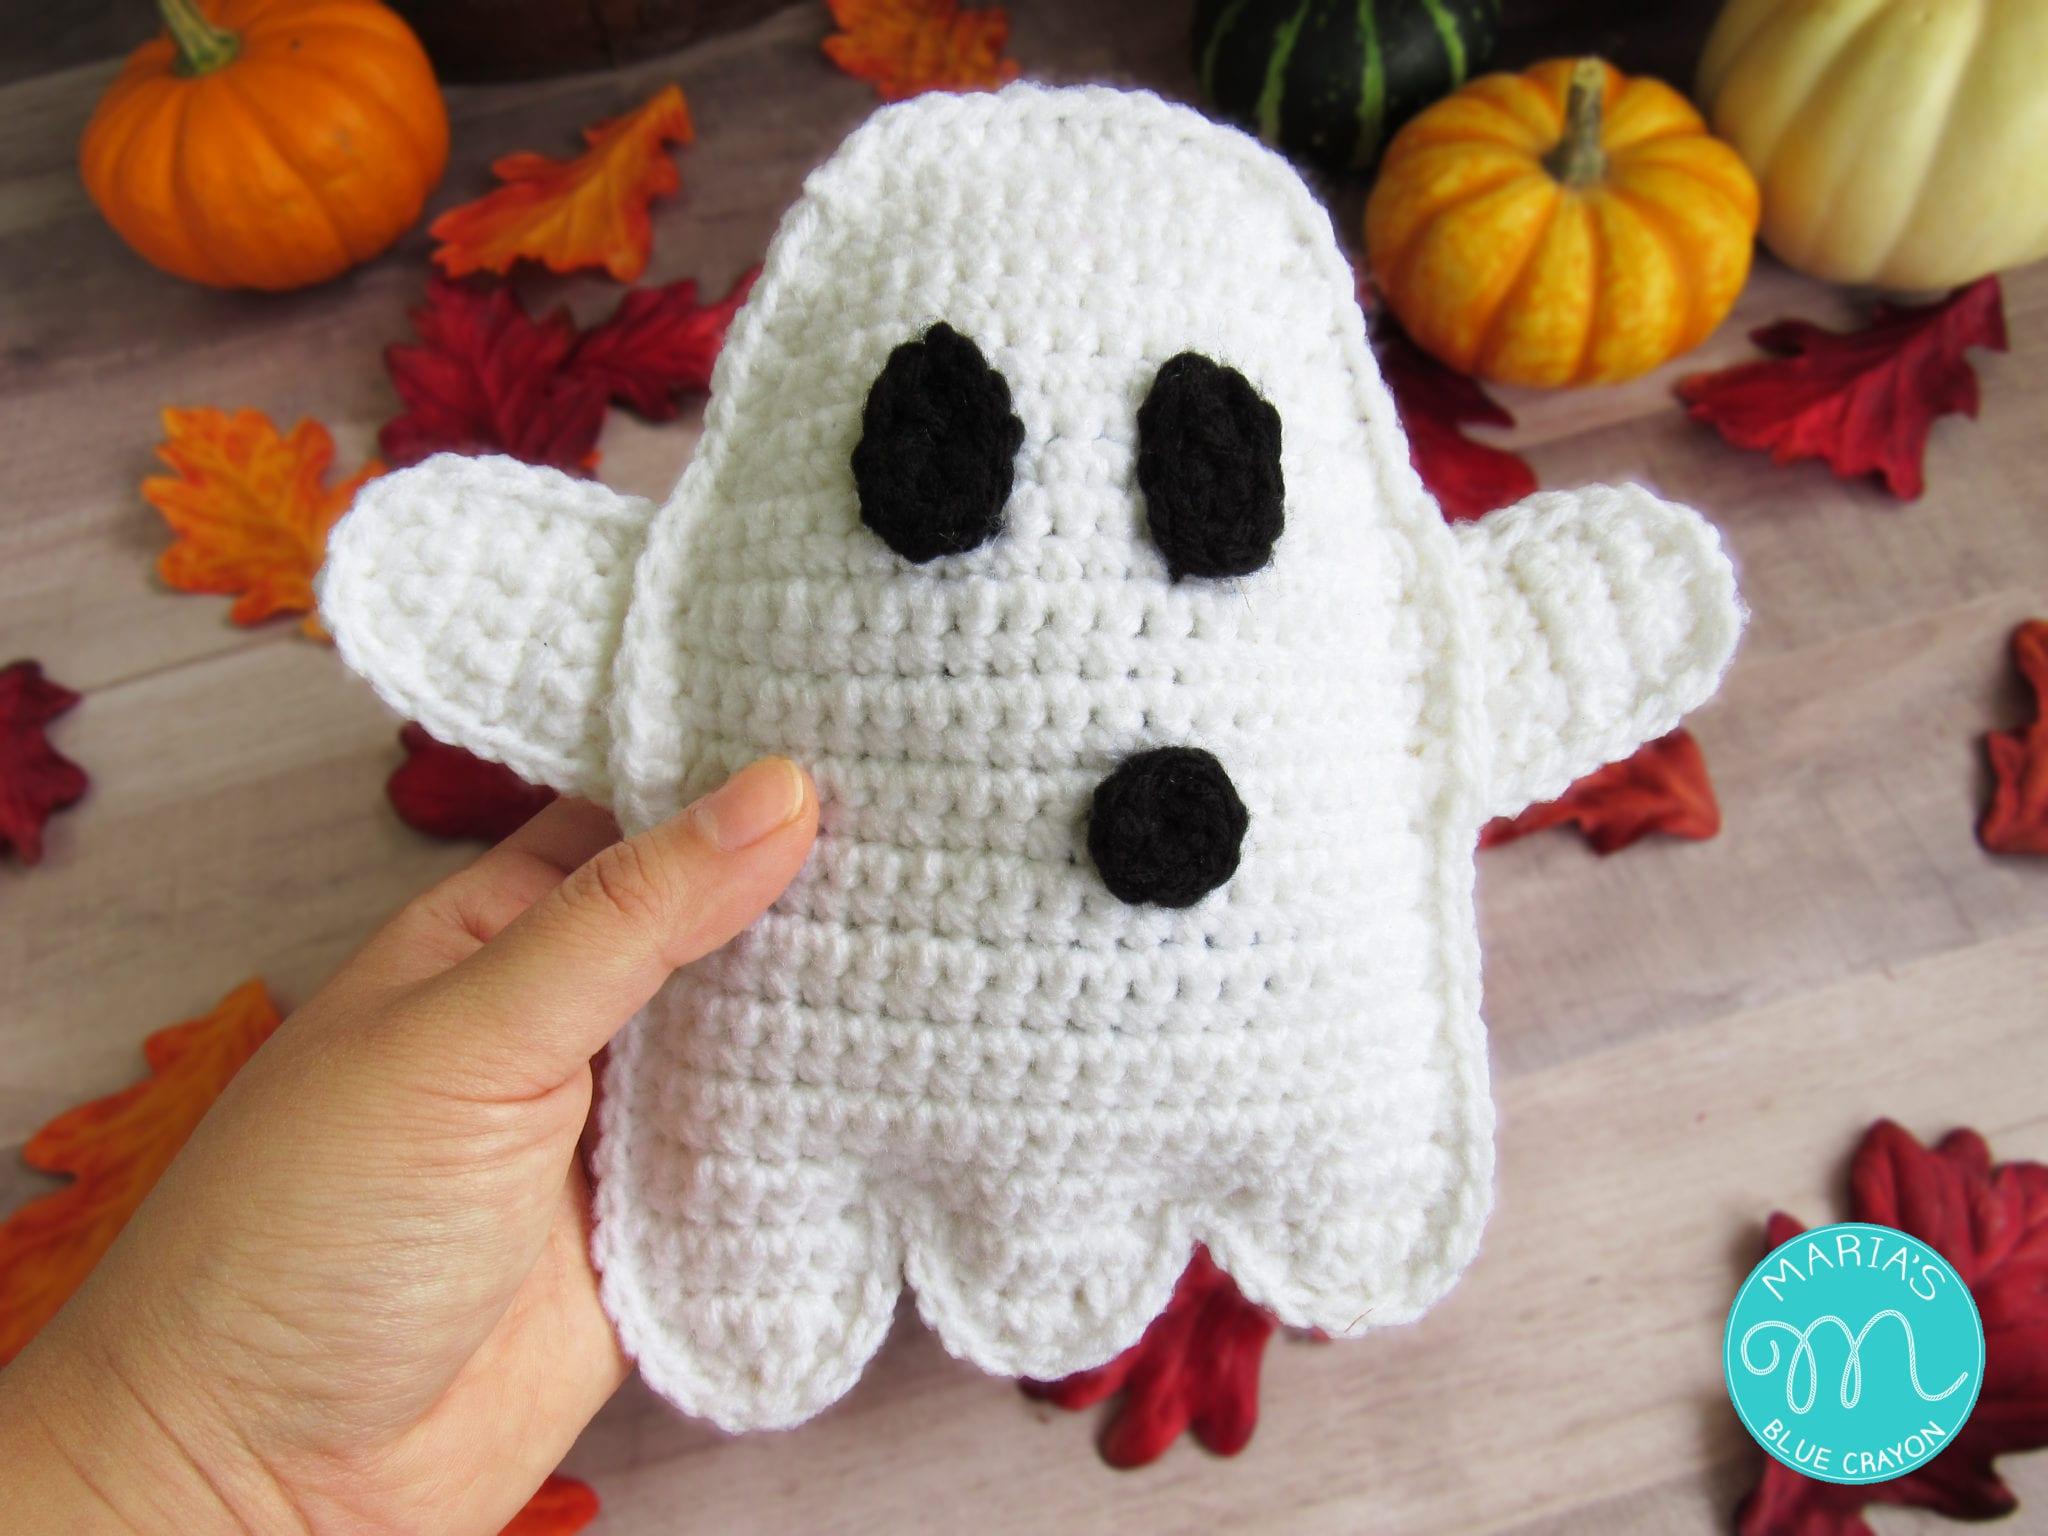 Crochet bat amigurumi pattern - Amigurumi Today | 1536x2048